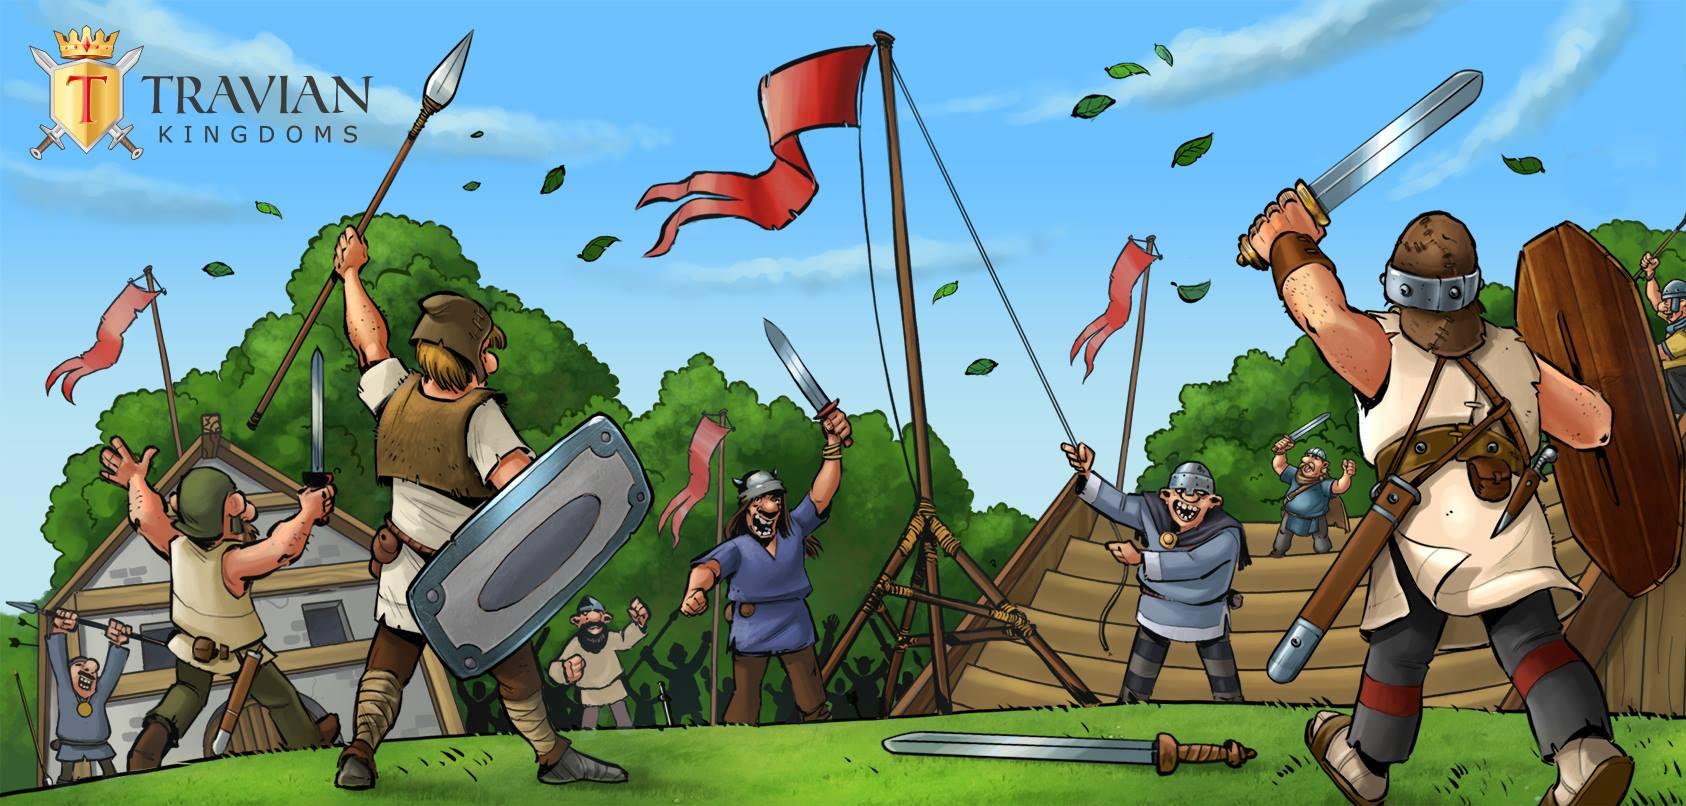 Travian: Kingdoms Images - Pivotal Gamers